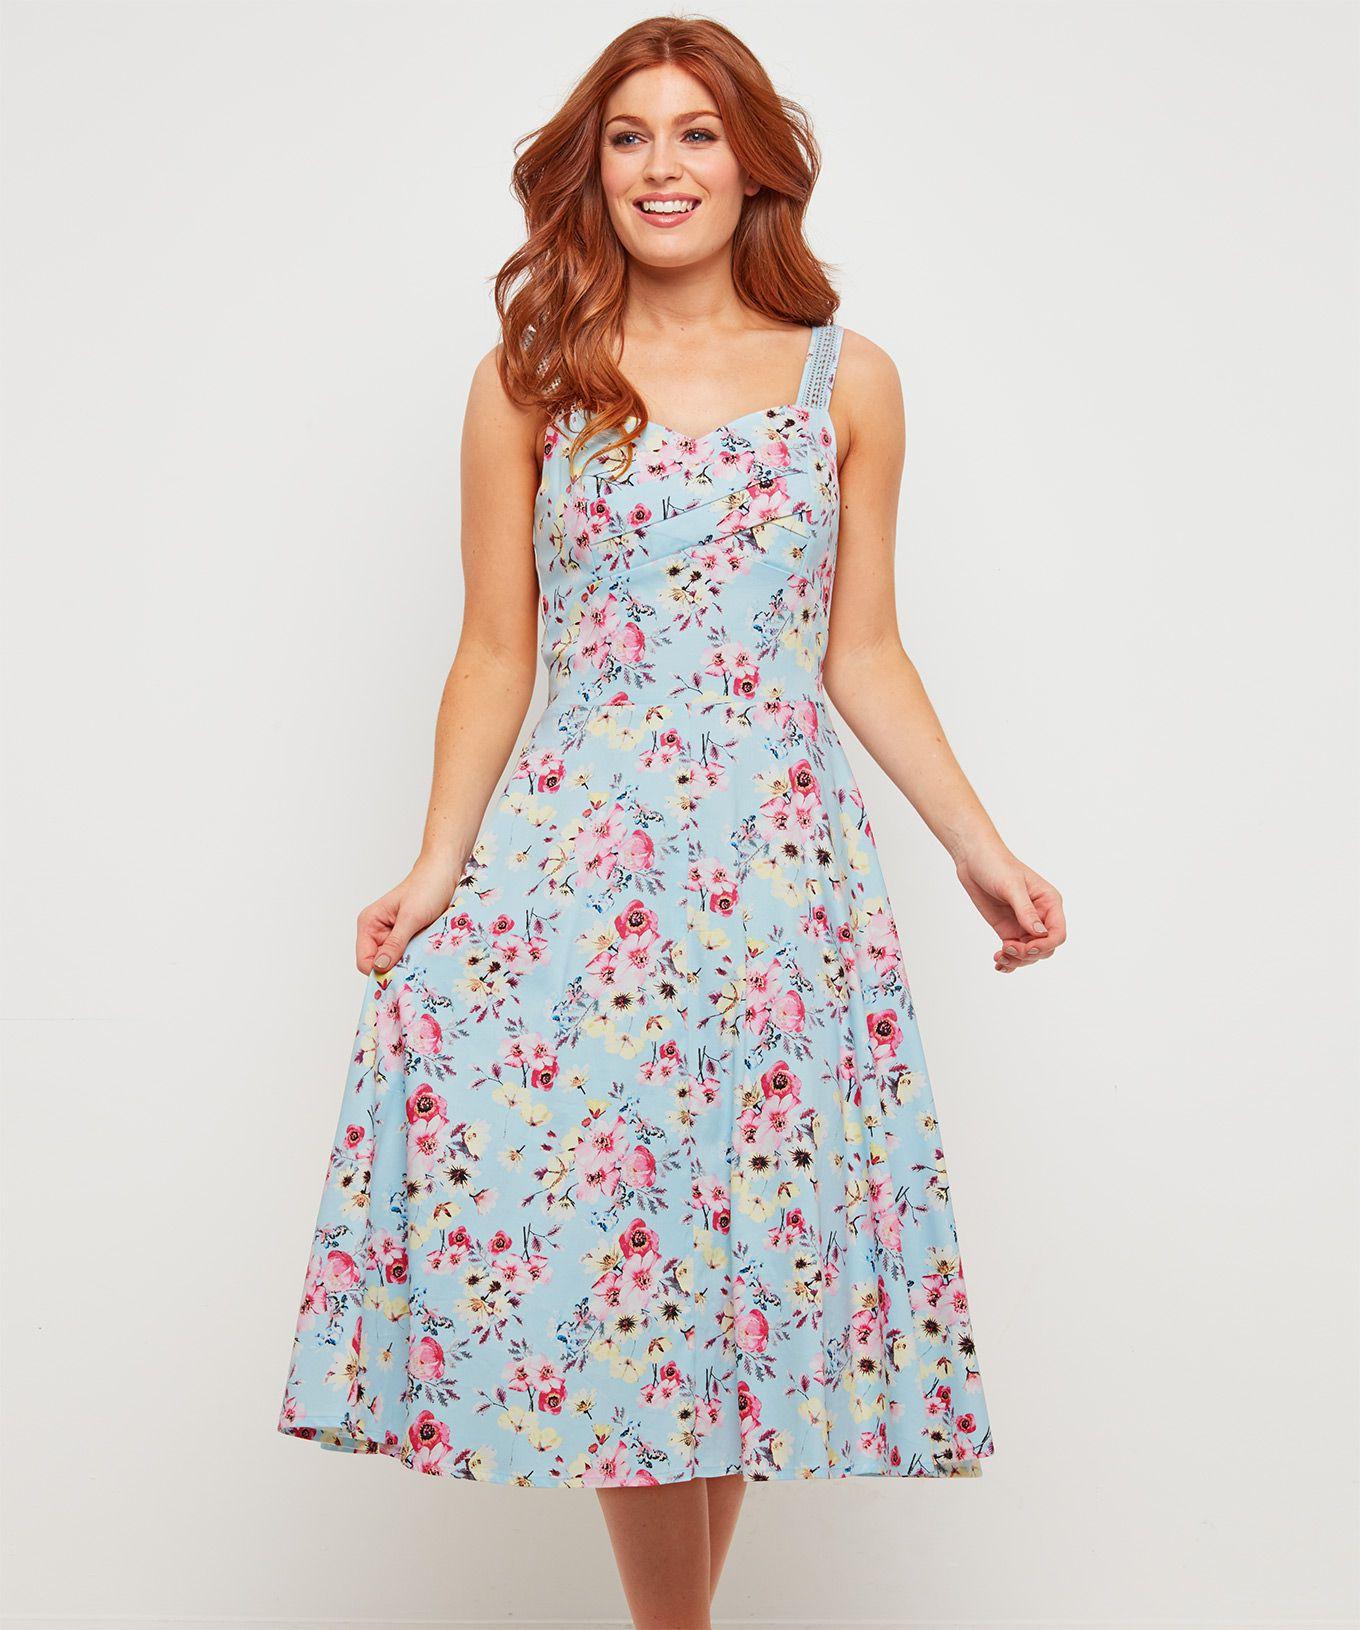 c1e4fc916dcc Joe Browns Svetlo-modré kvetinové šaty - JoyStore.sk